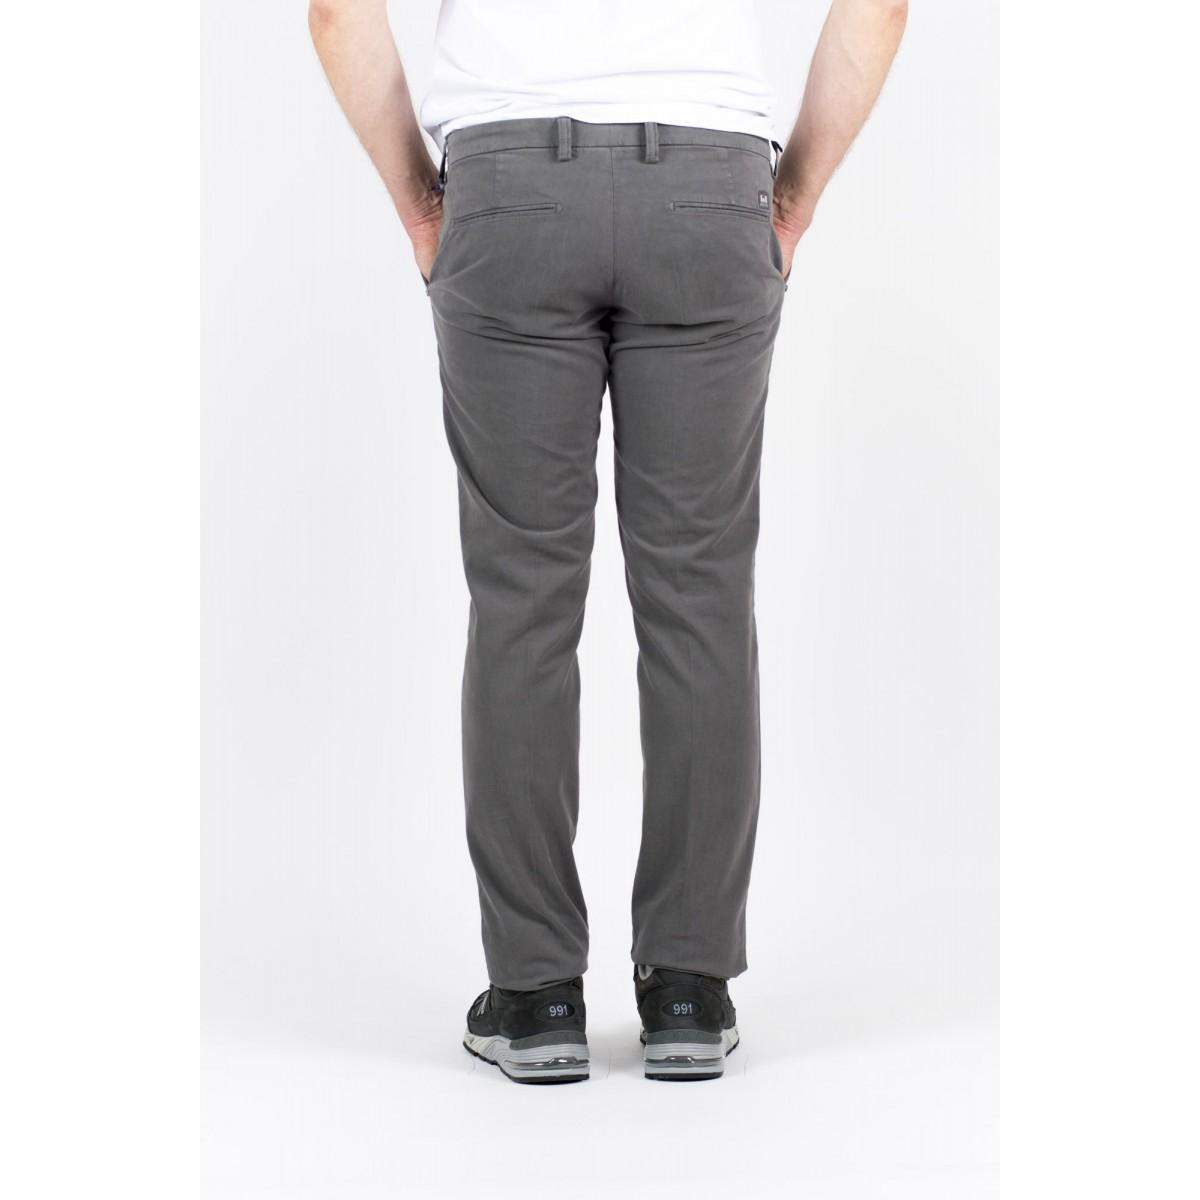 Trousers Entre Amis Man - A15 8201 302 - Grigio